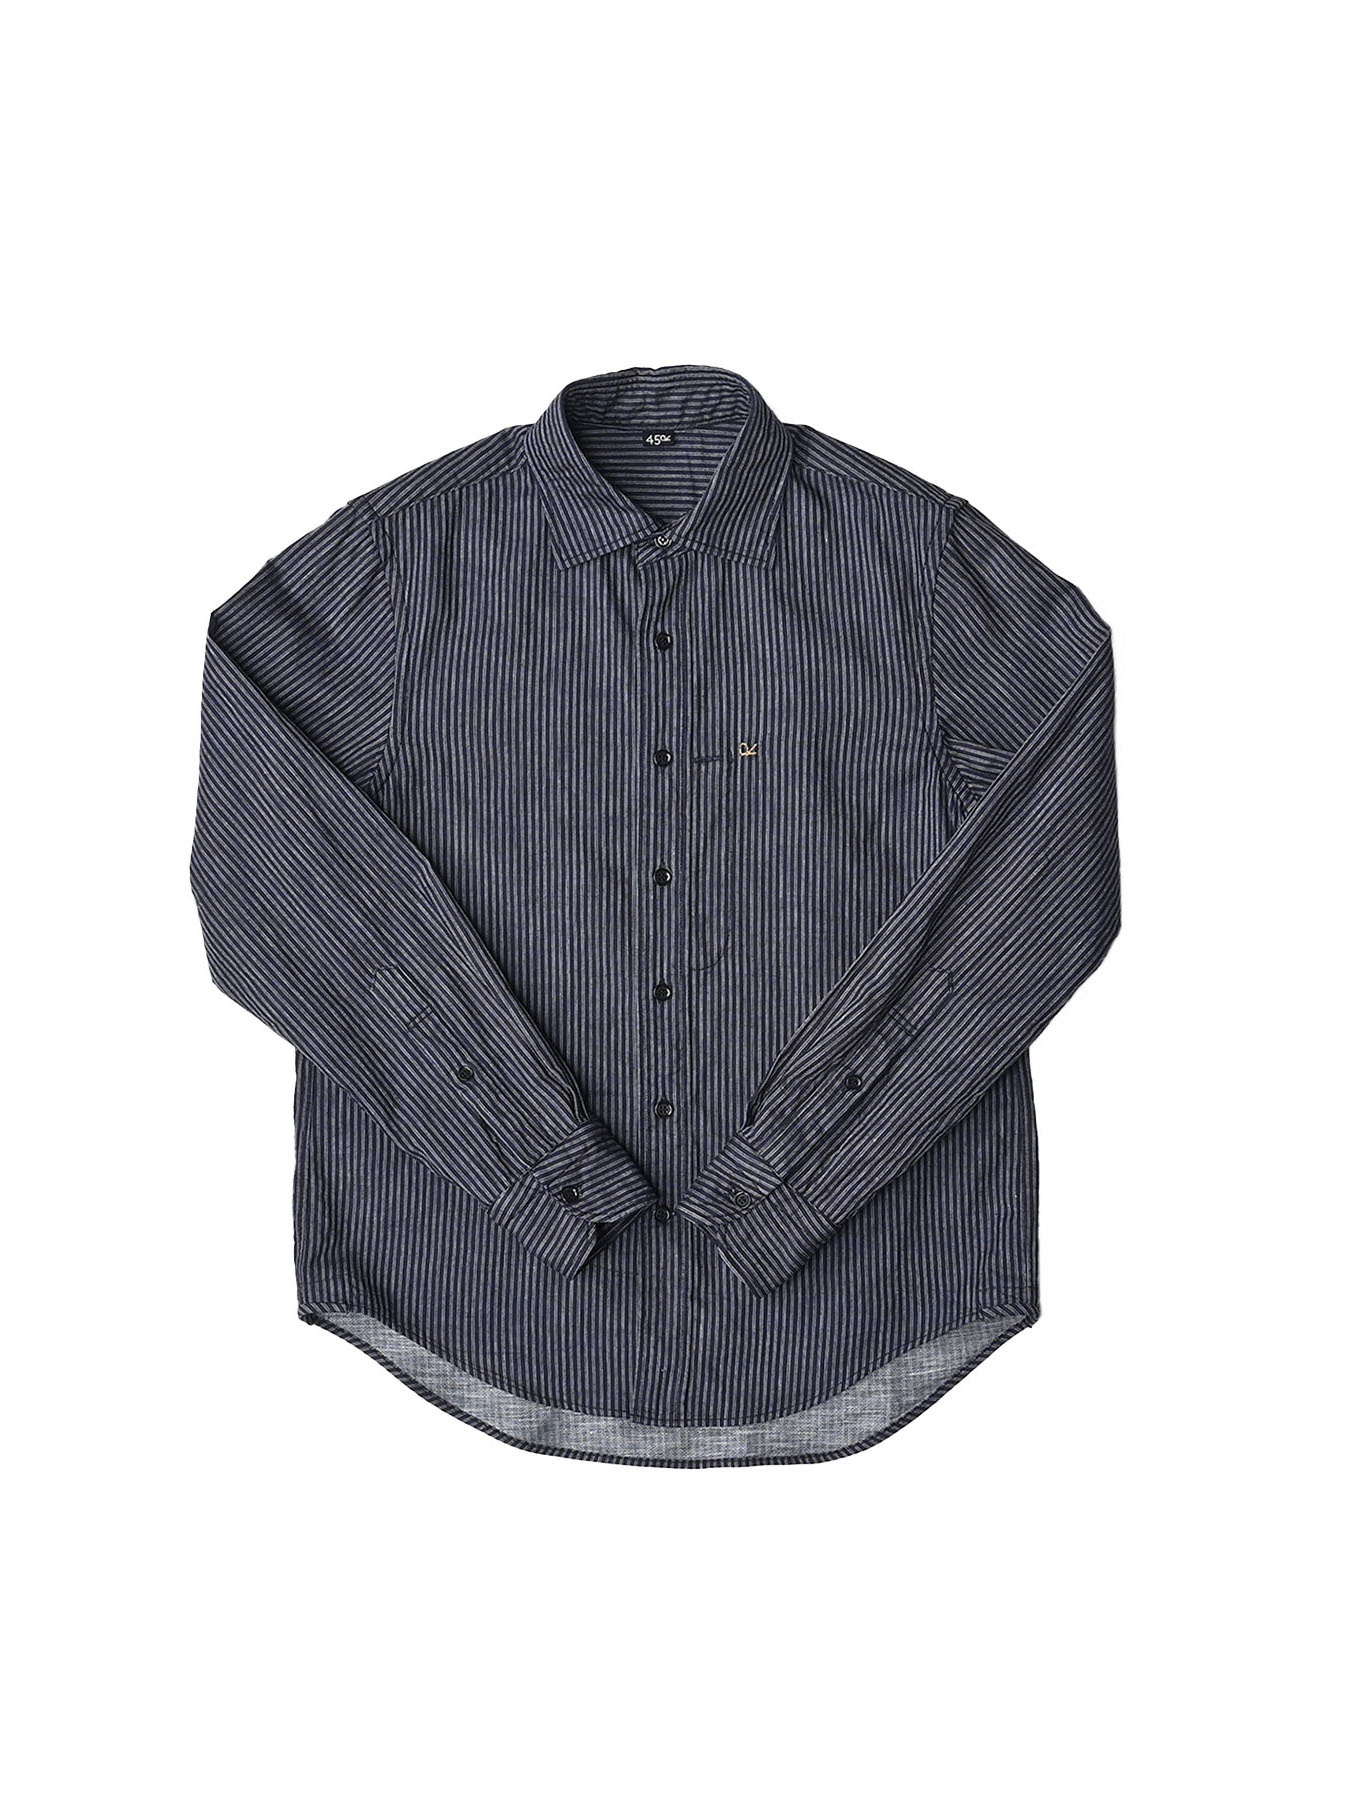 Indigo Double Cloth 908 Regular Shirt-10